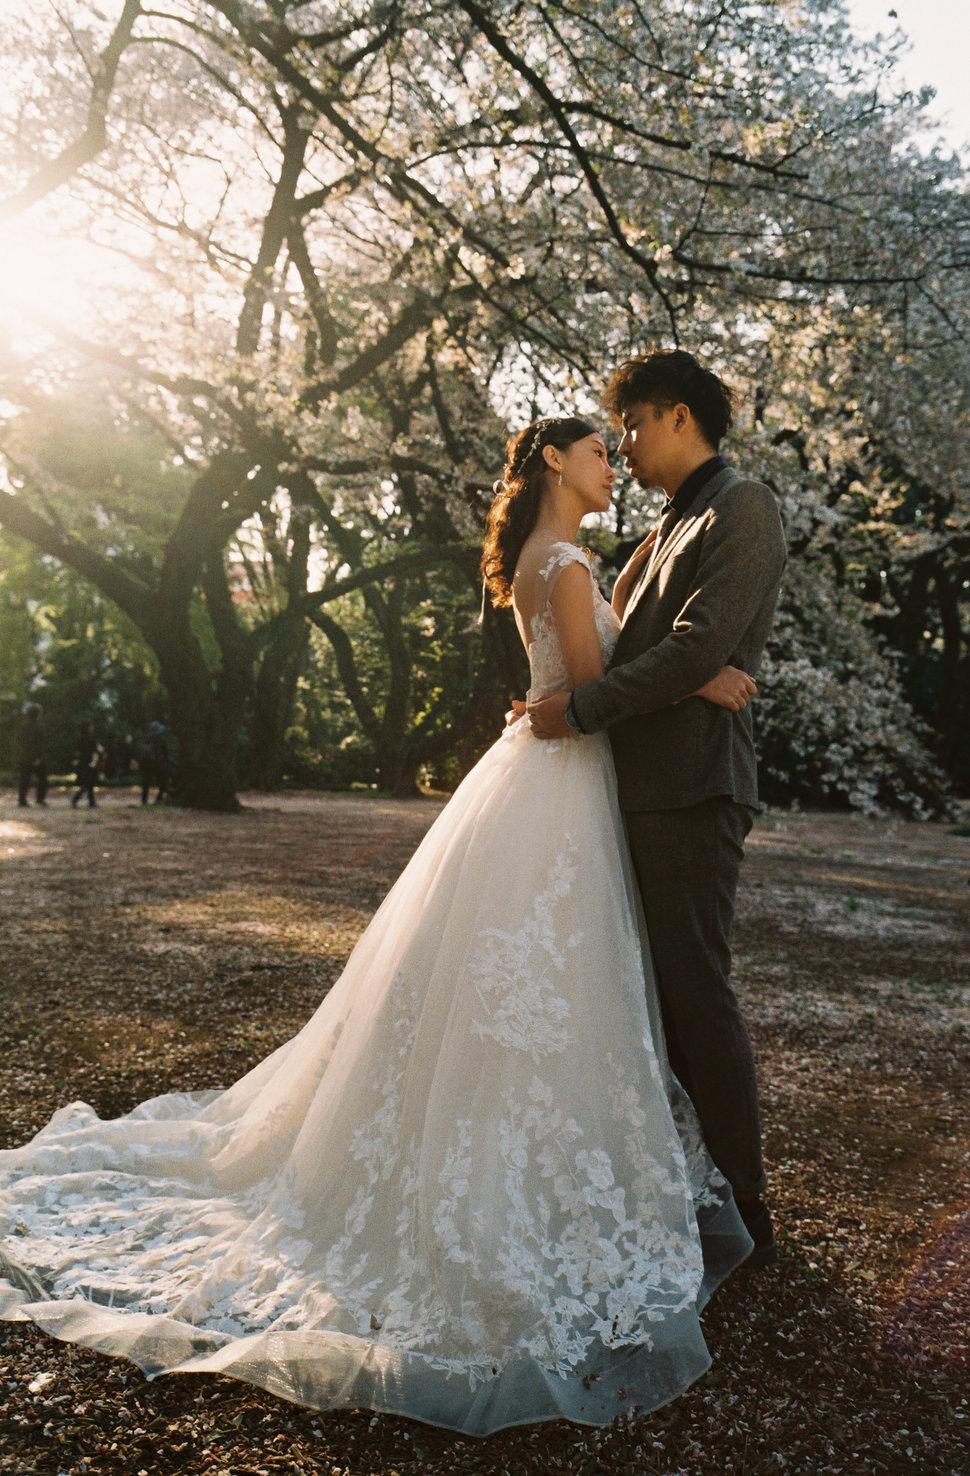 CNV000016 - All Good Wedding - 結婚吧